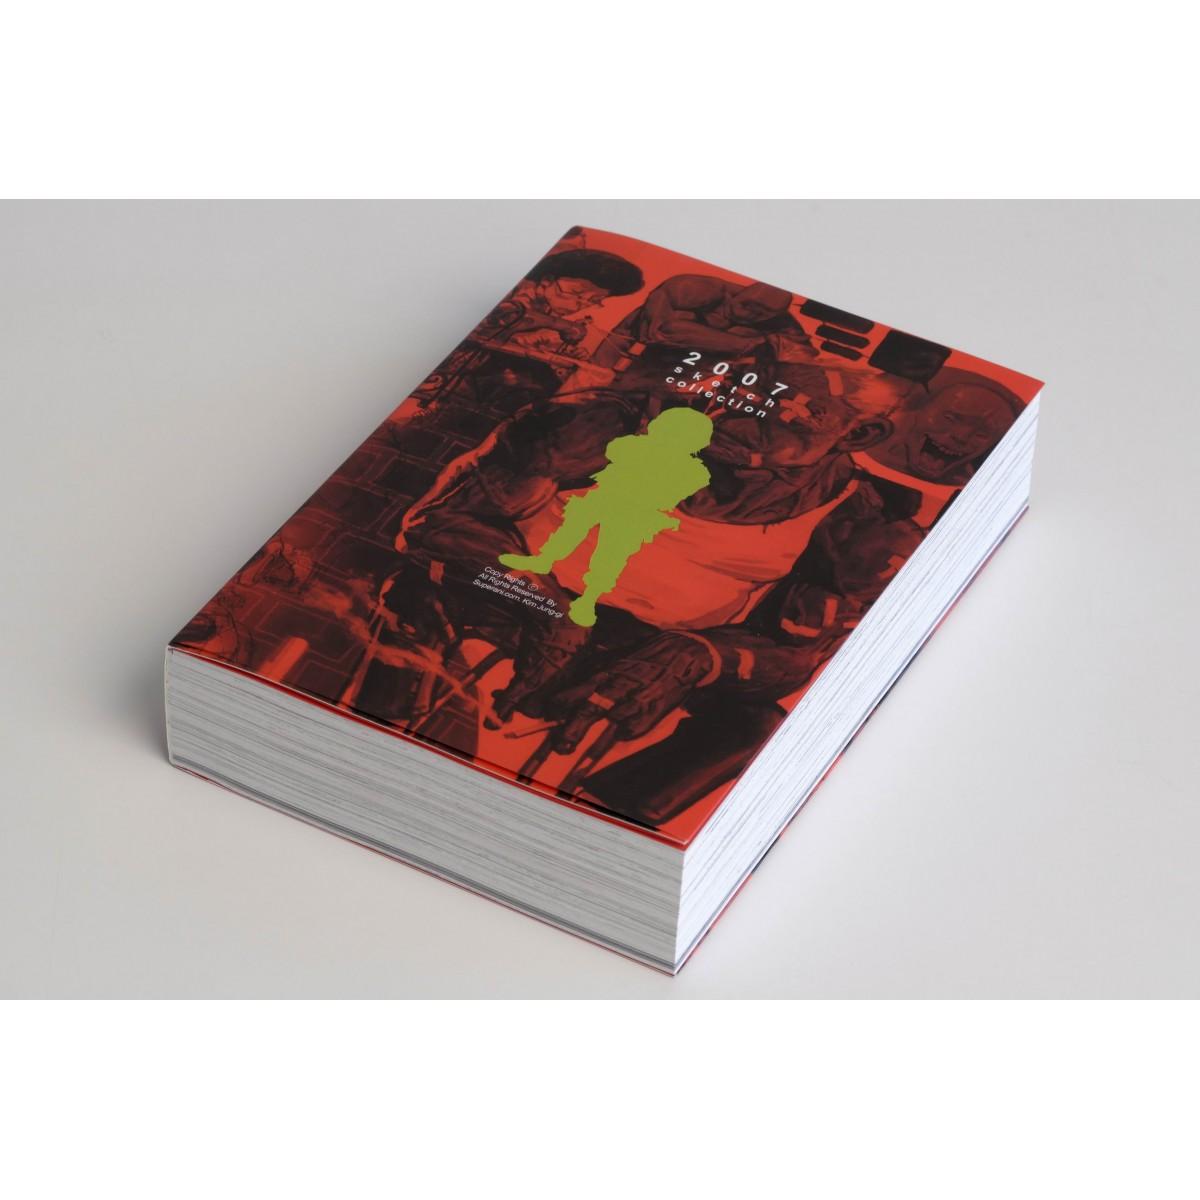 Kim Jung Gi - Sketchbook 2007